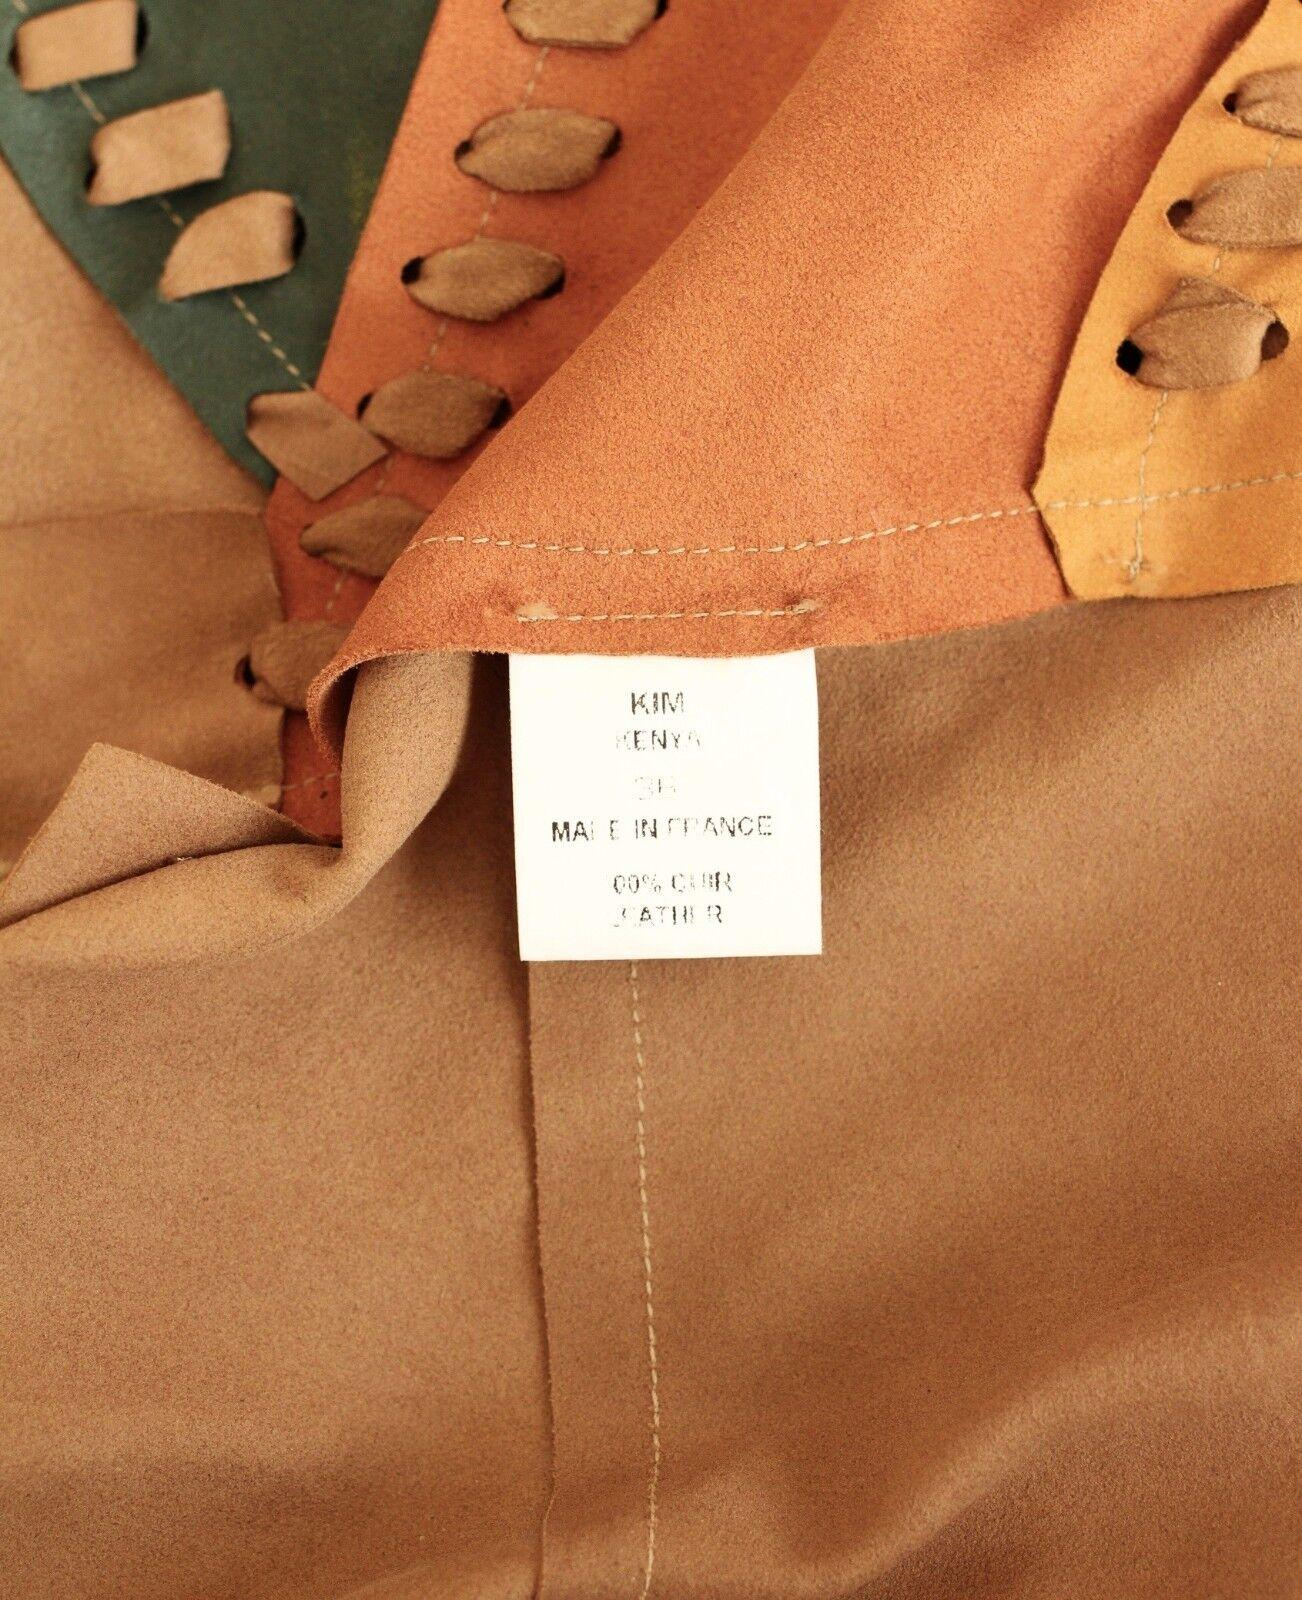 VENTCOUgreen Kim Kenya suede leather top tassels FR36 UK8 UK8 UK8 US2-4 957308